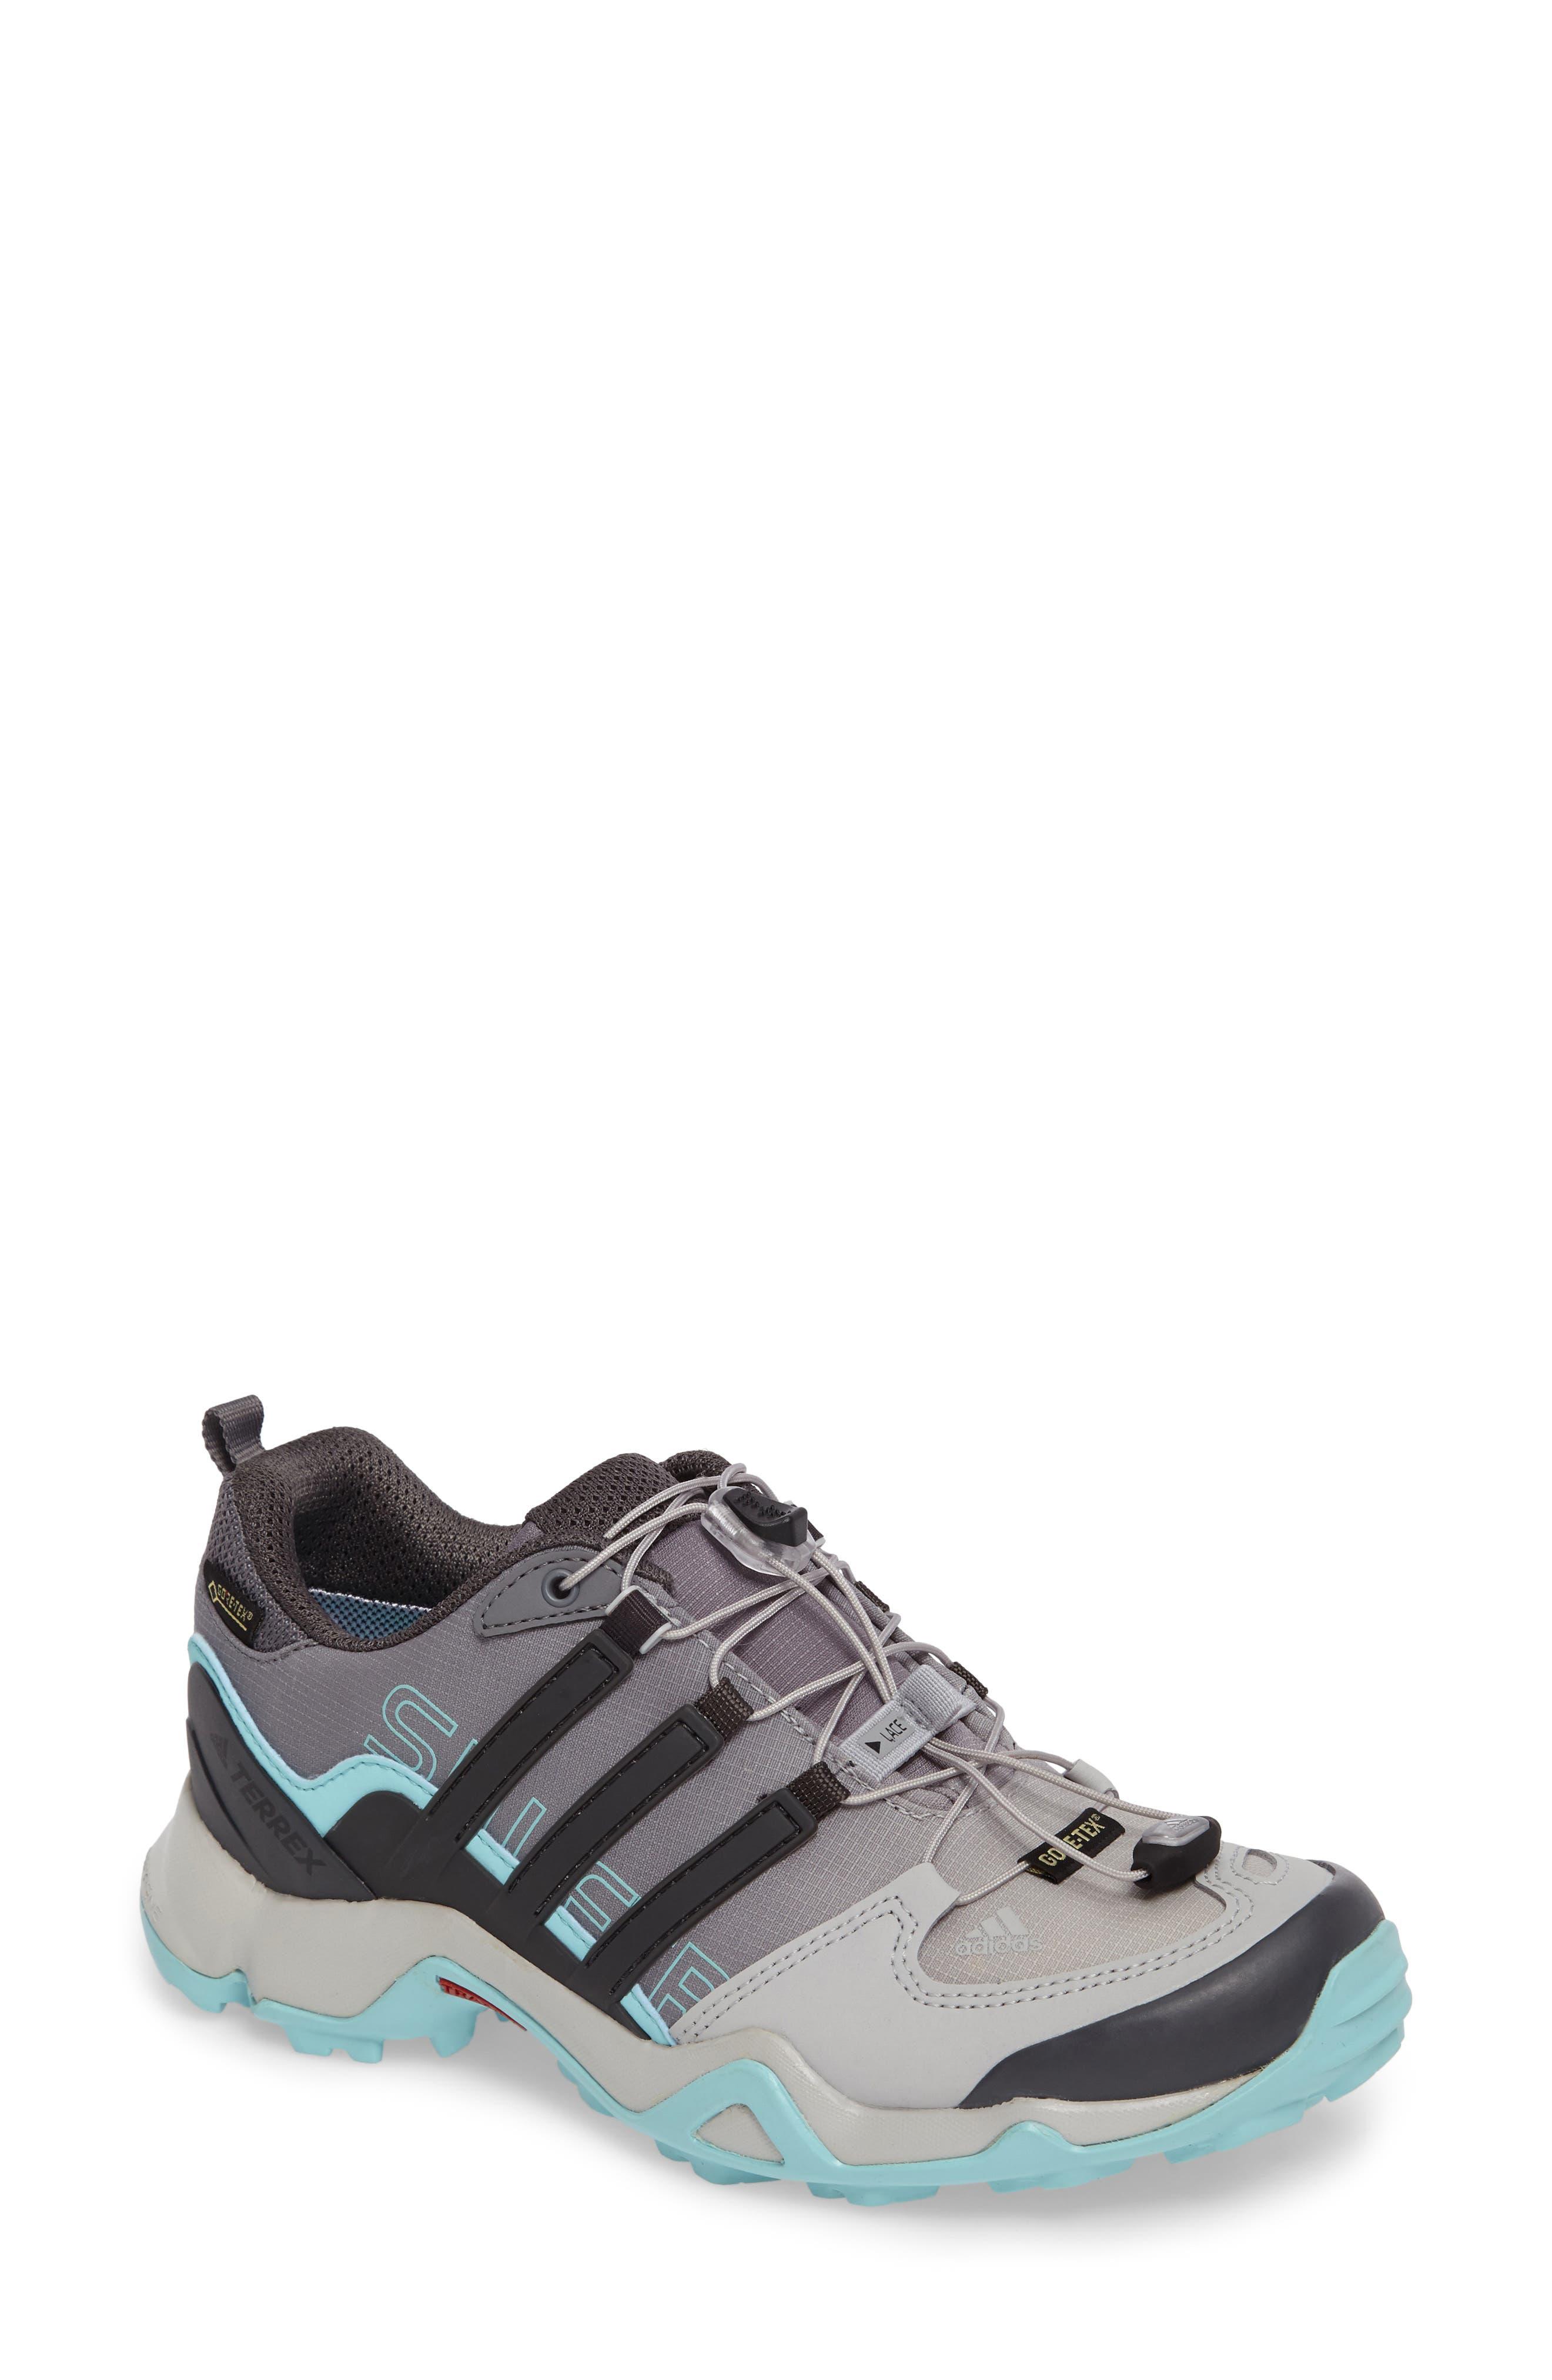 Terrex Swift R GTX Hiking Shoe,                         Main,                         color, 020